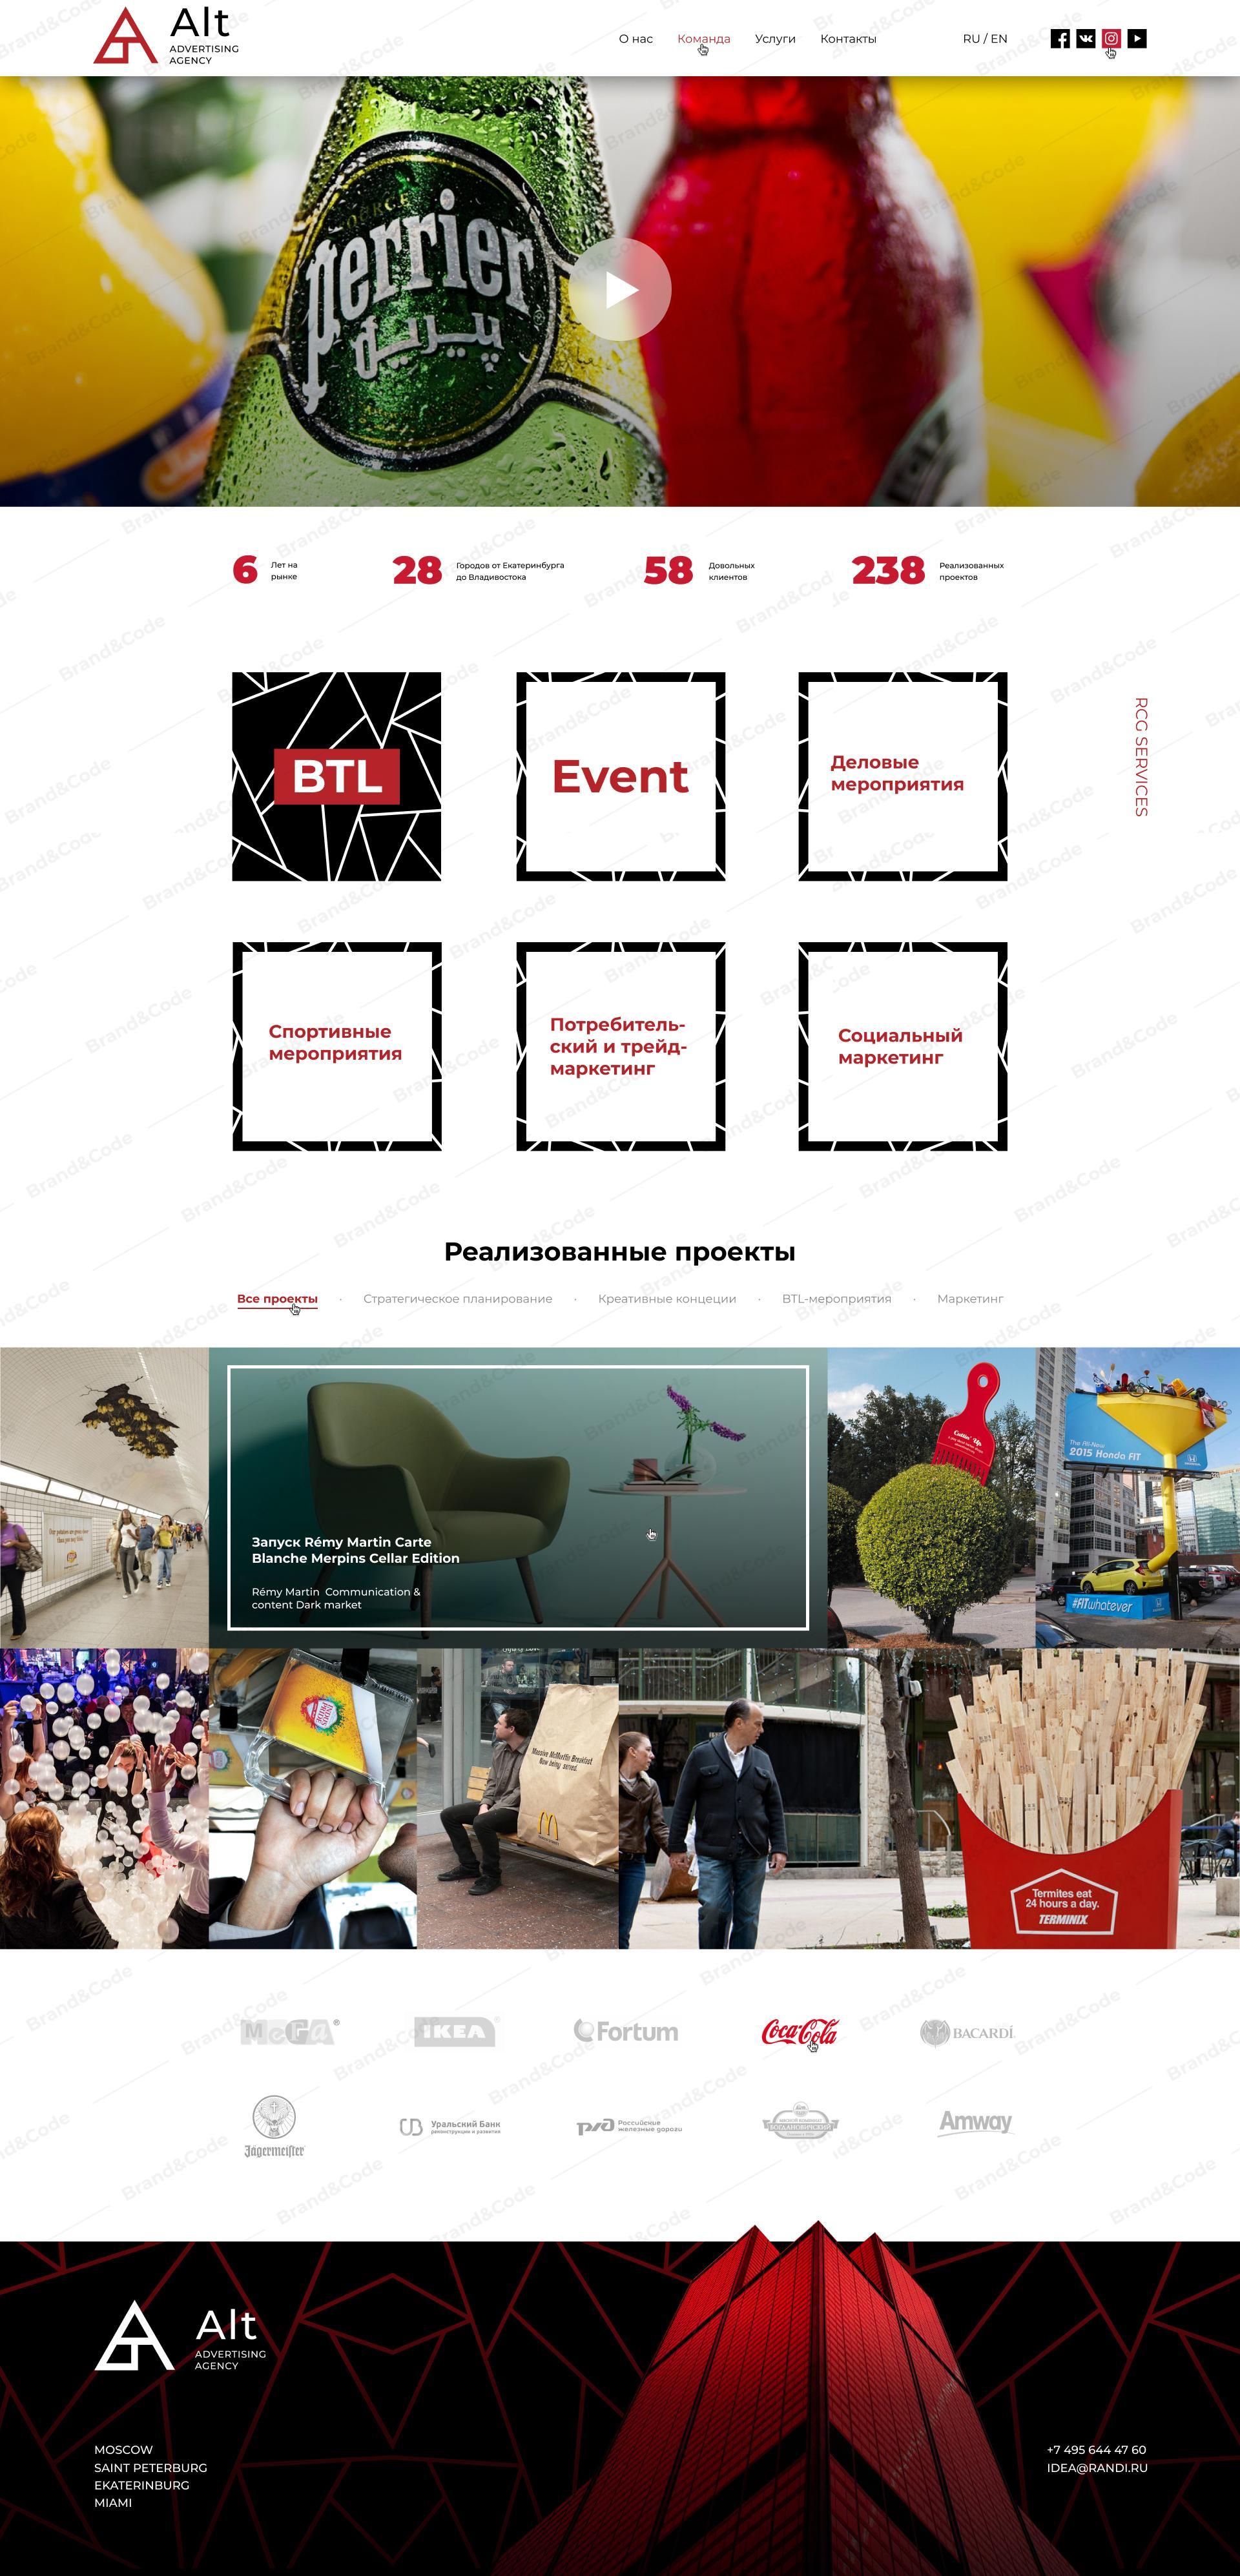 Alt - международное рекламное агентство корпоративный сайт